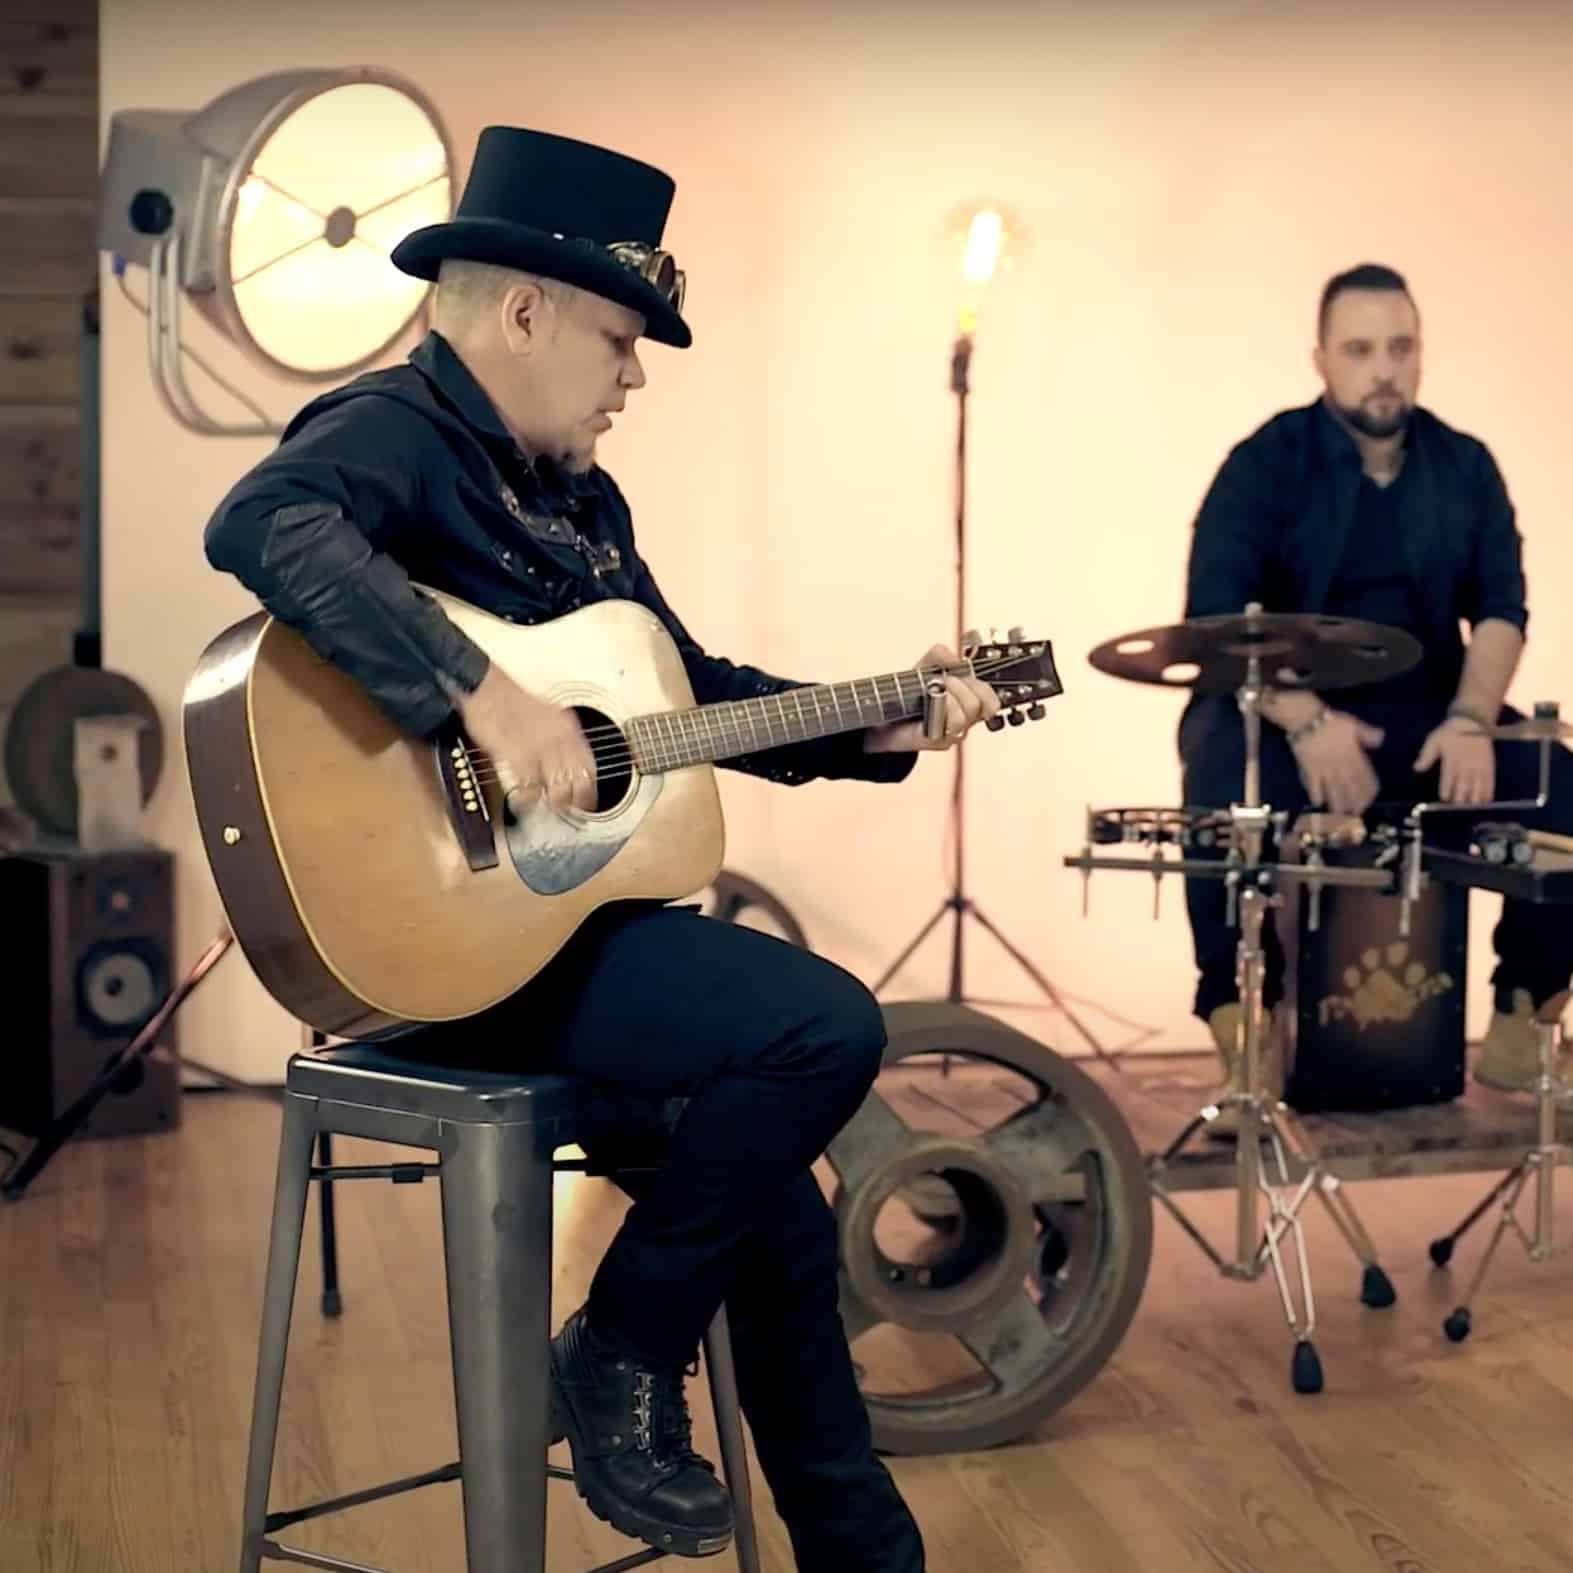 The Blake Project - They Are My Friends, tournage de clip par Bibam Production